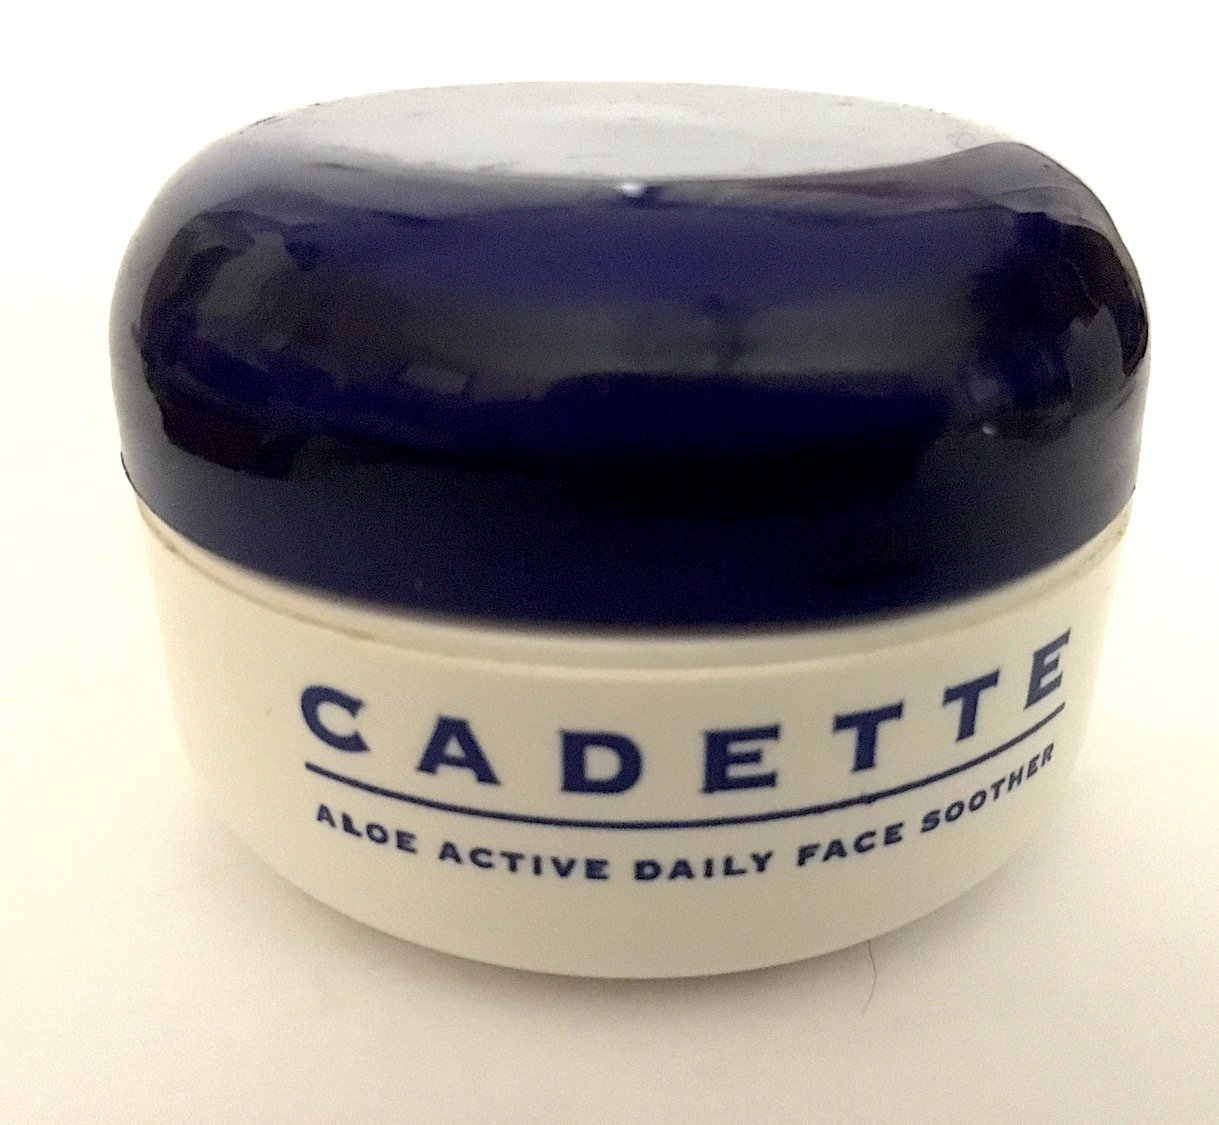 Amazon.com: Cadette Aloe Active Face Chupete: Beauty